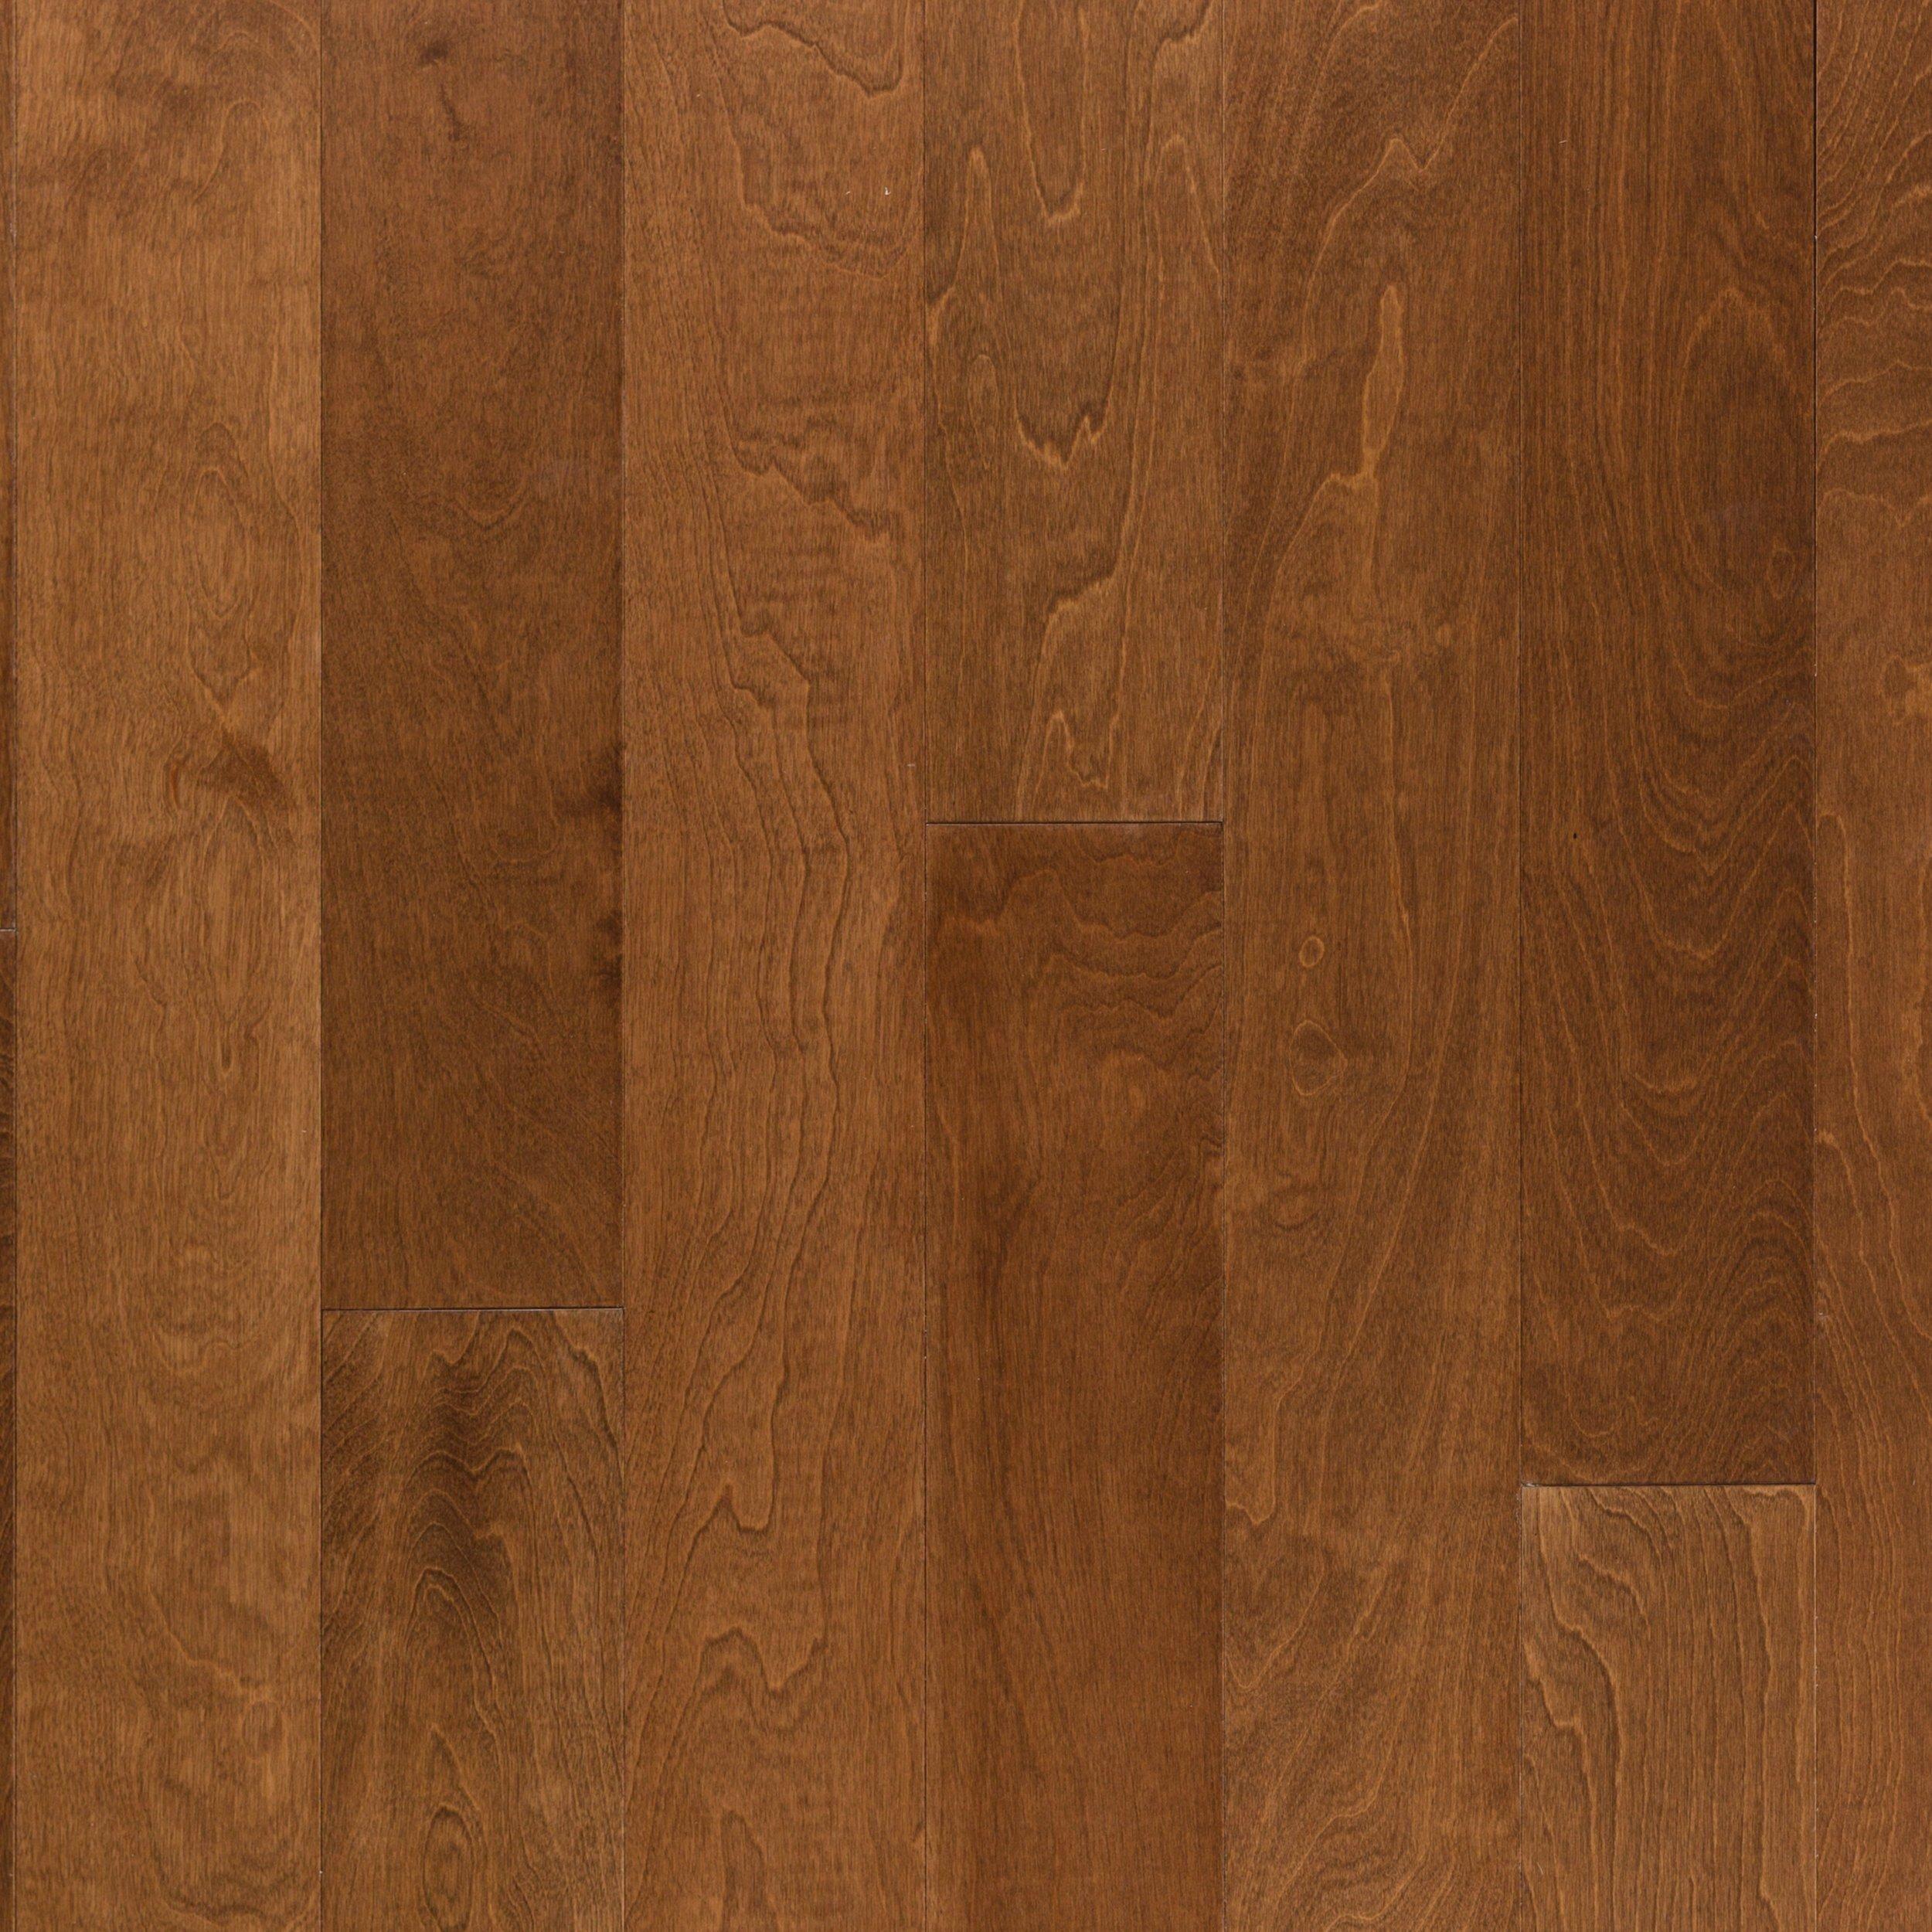 Honey Birch Smooth Engineered Hardwood Hardwood Engineered Hardwood Birch Floors